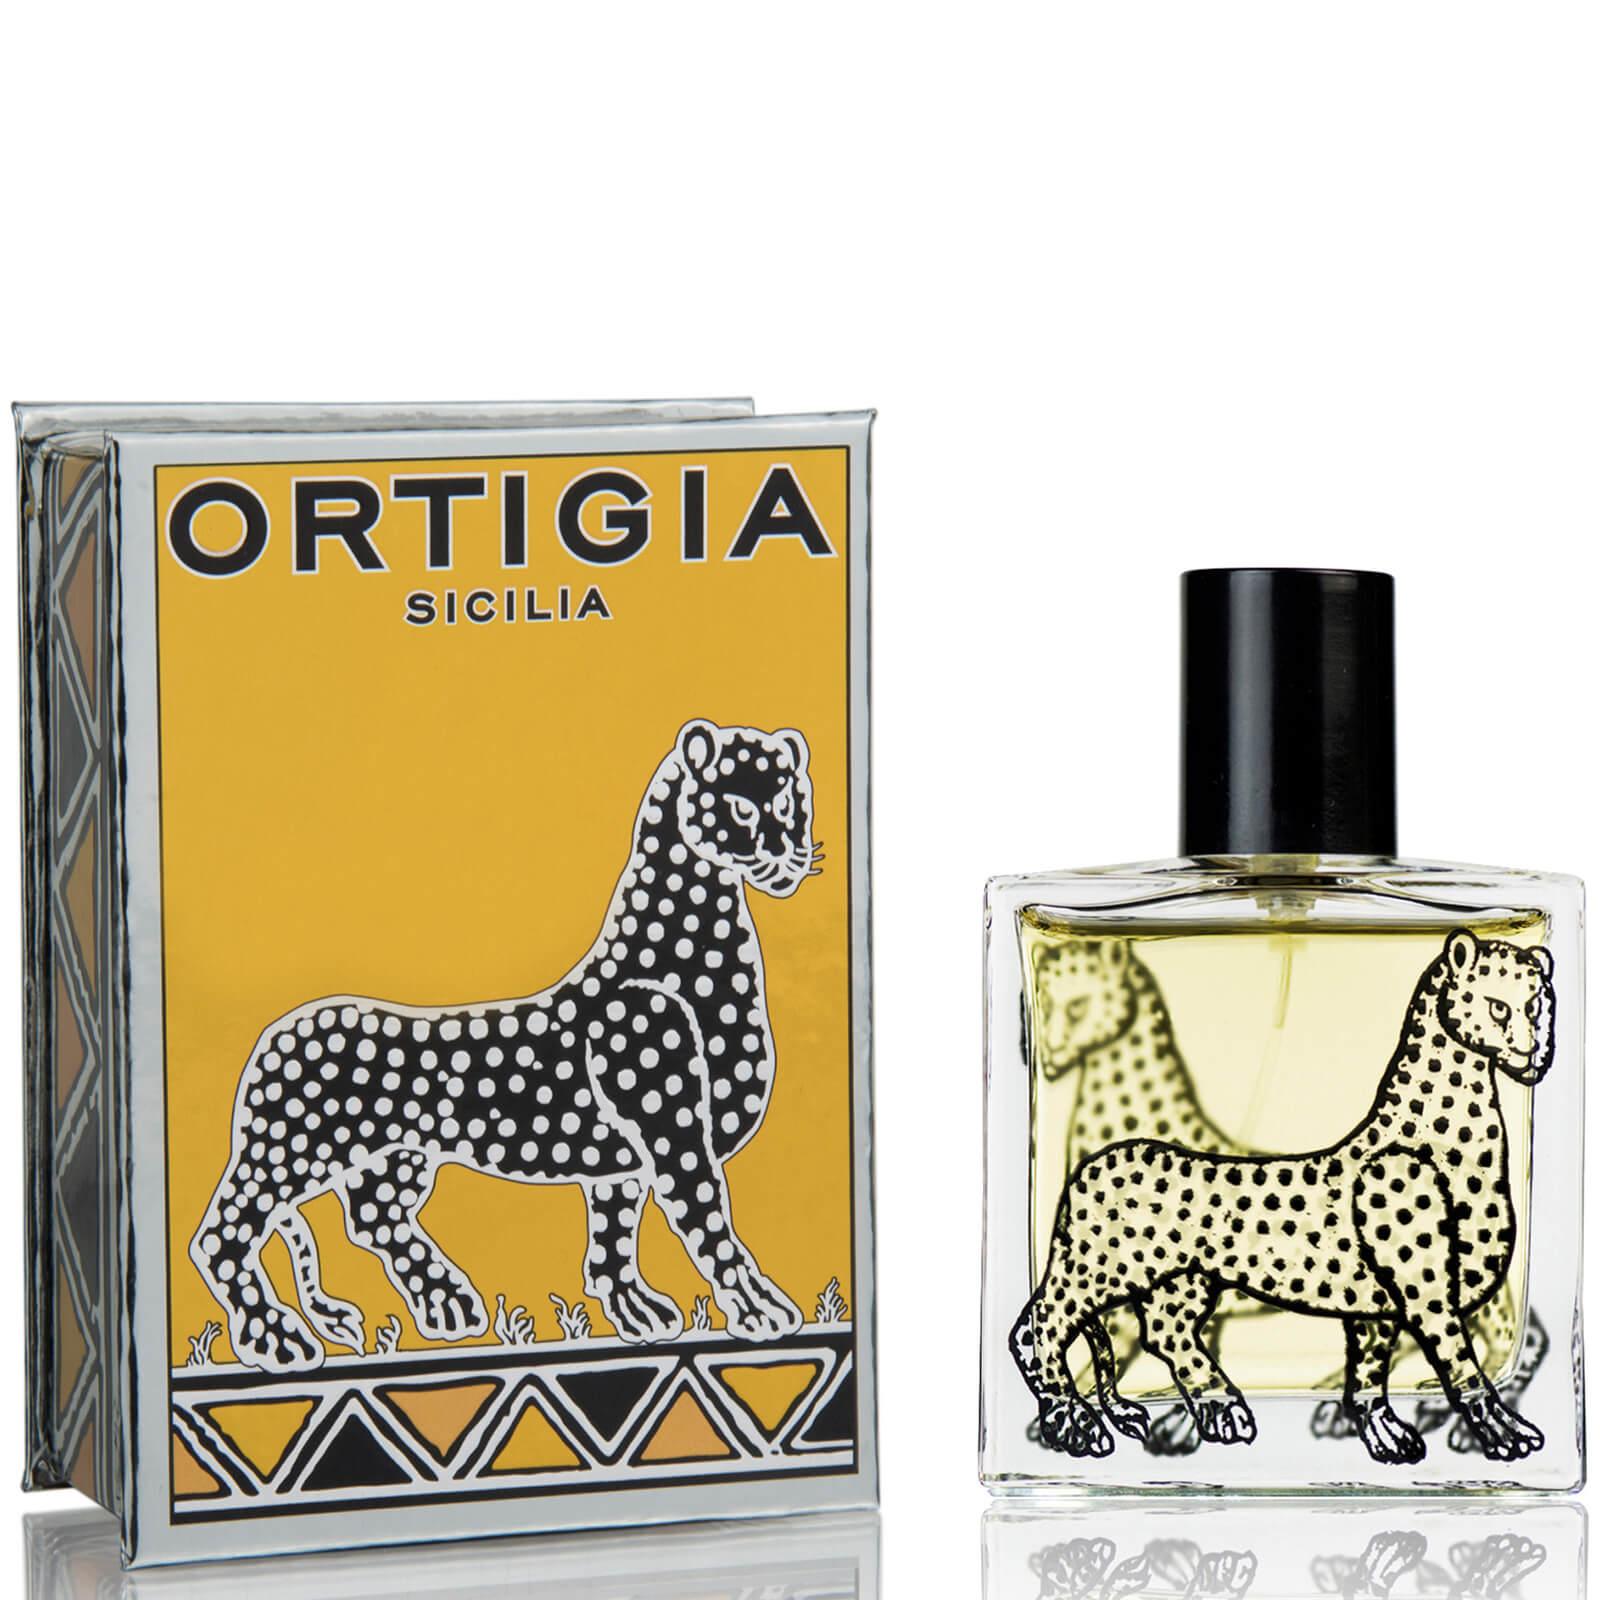 Ortigia - Zagara Eau De Parfum Perfume 35ml - Yellow/Glass/Black